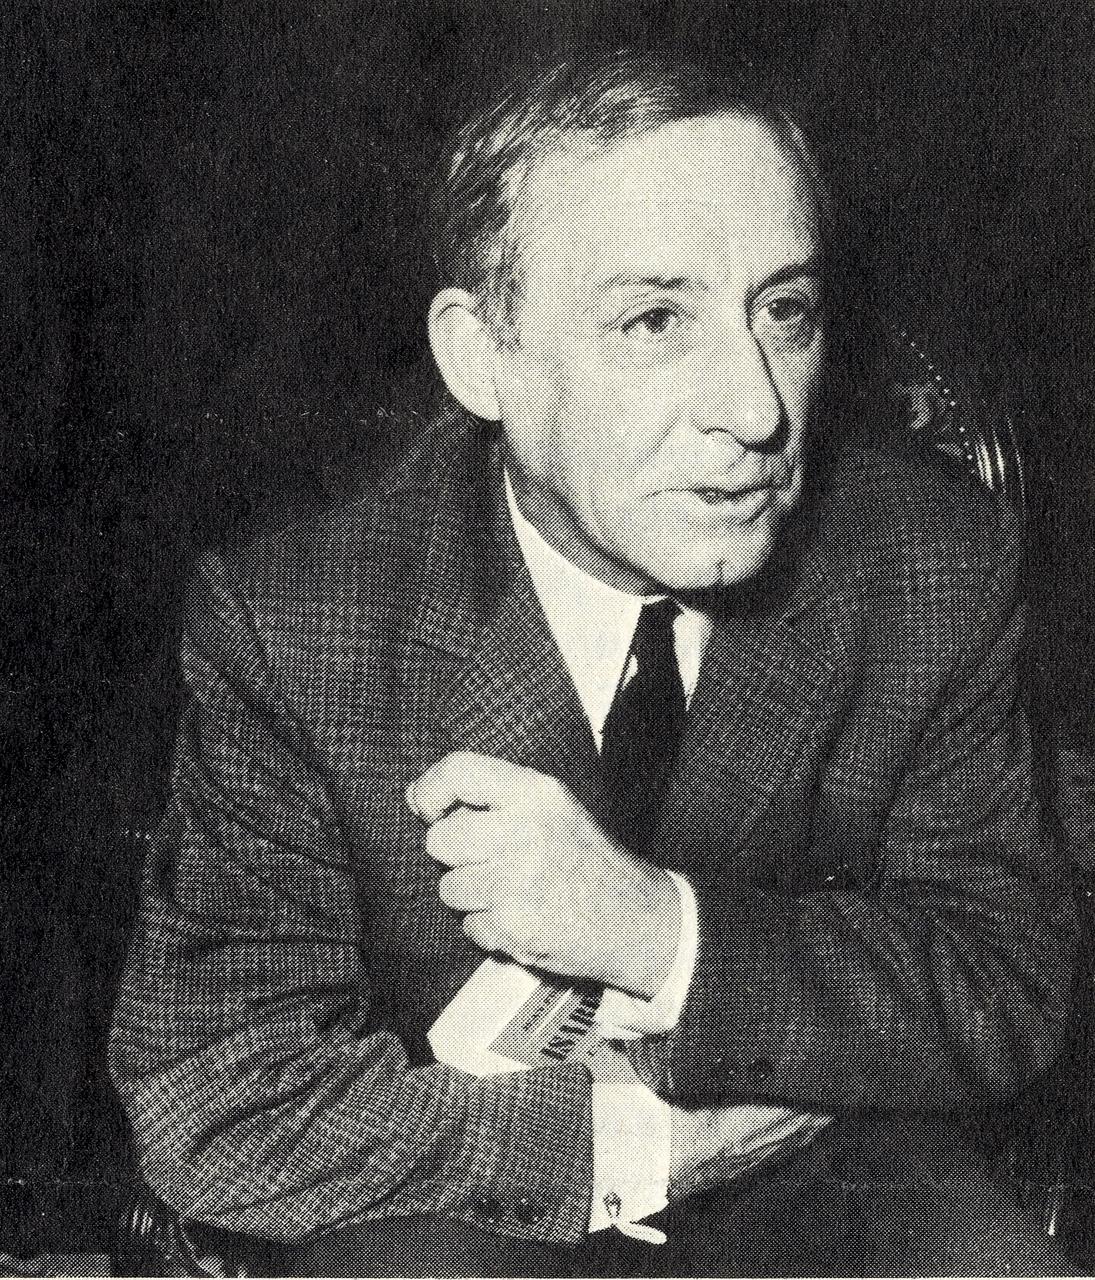 image for Freustié, Jean (1914-1983)